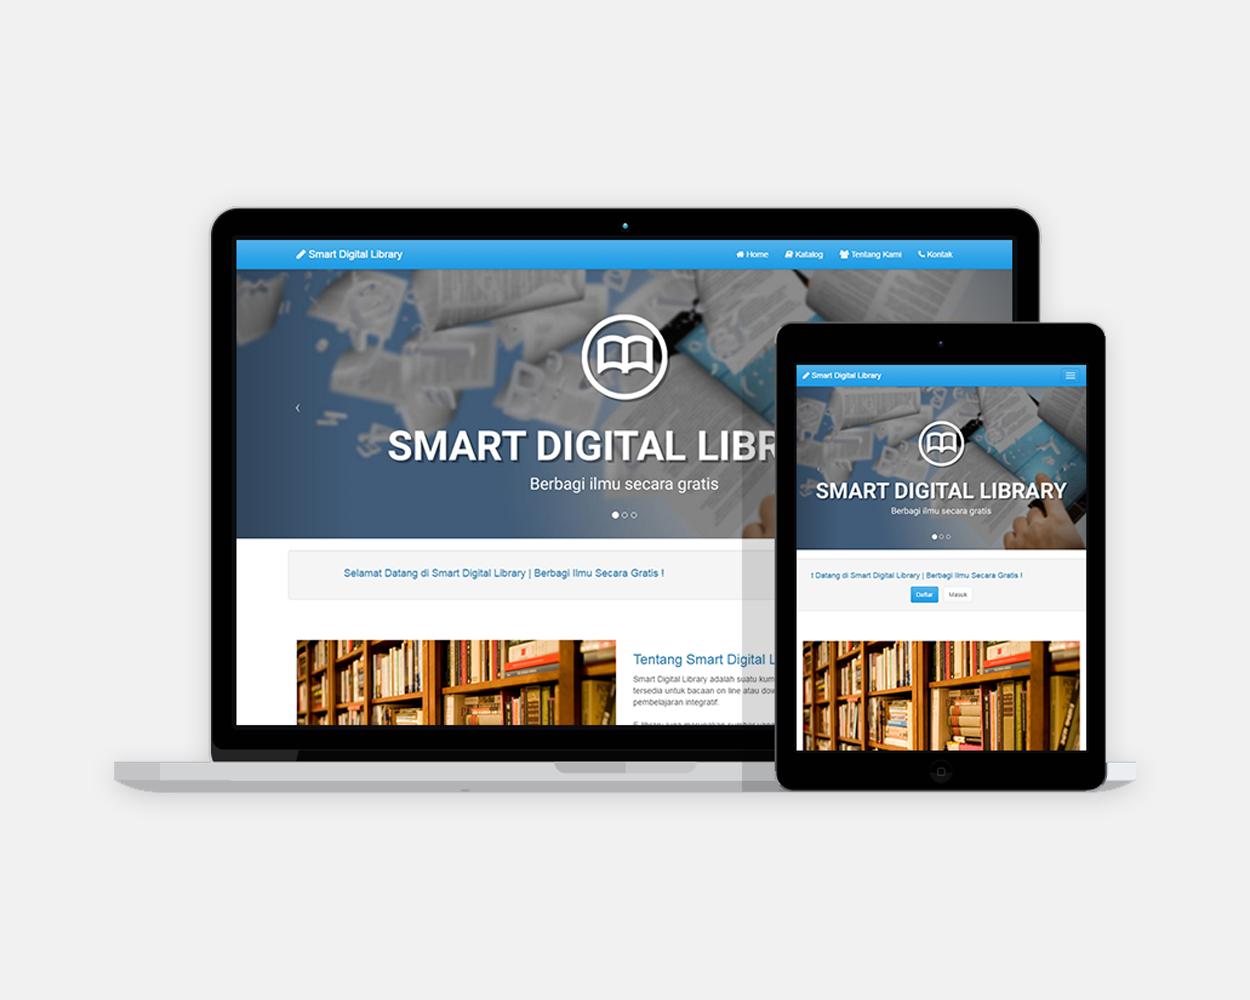 Smart Digital Library